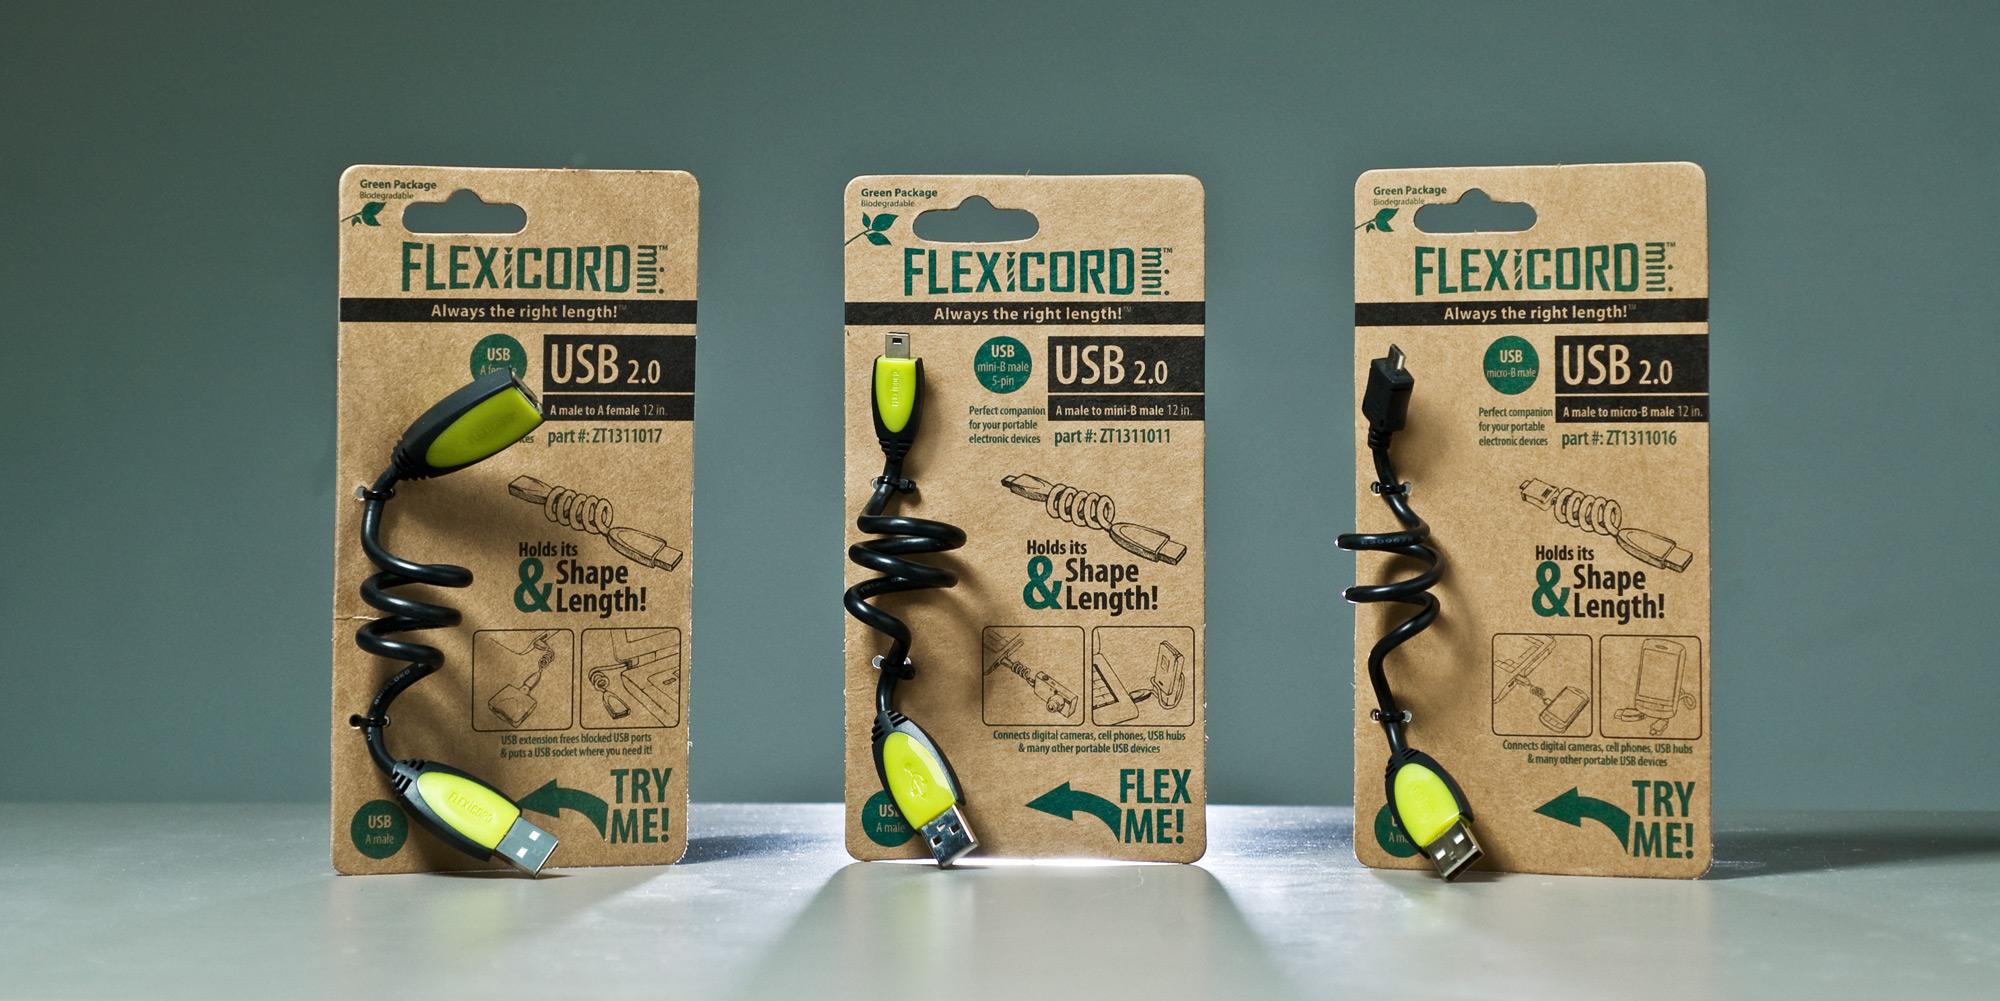 flexicord.jpg